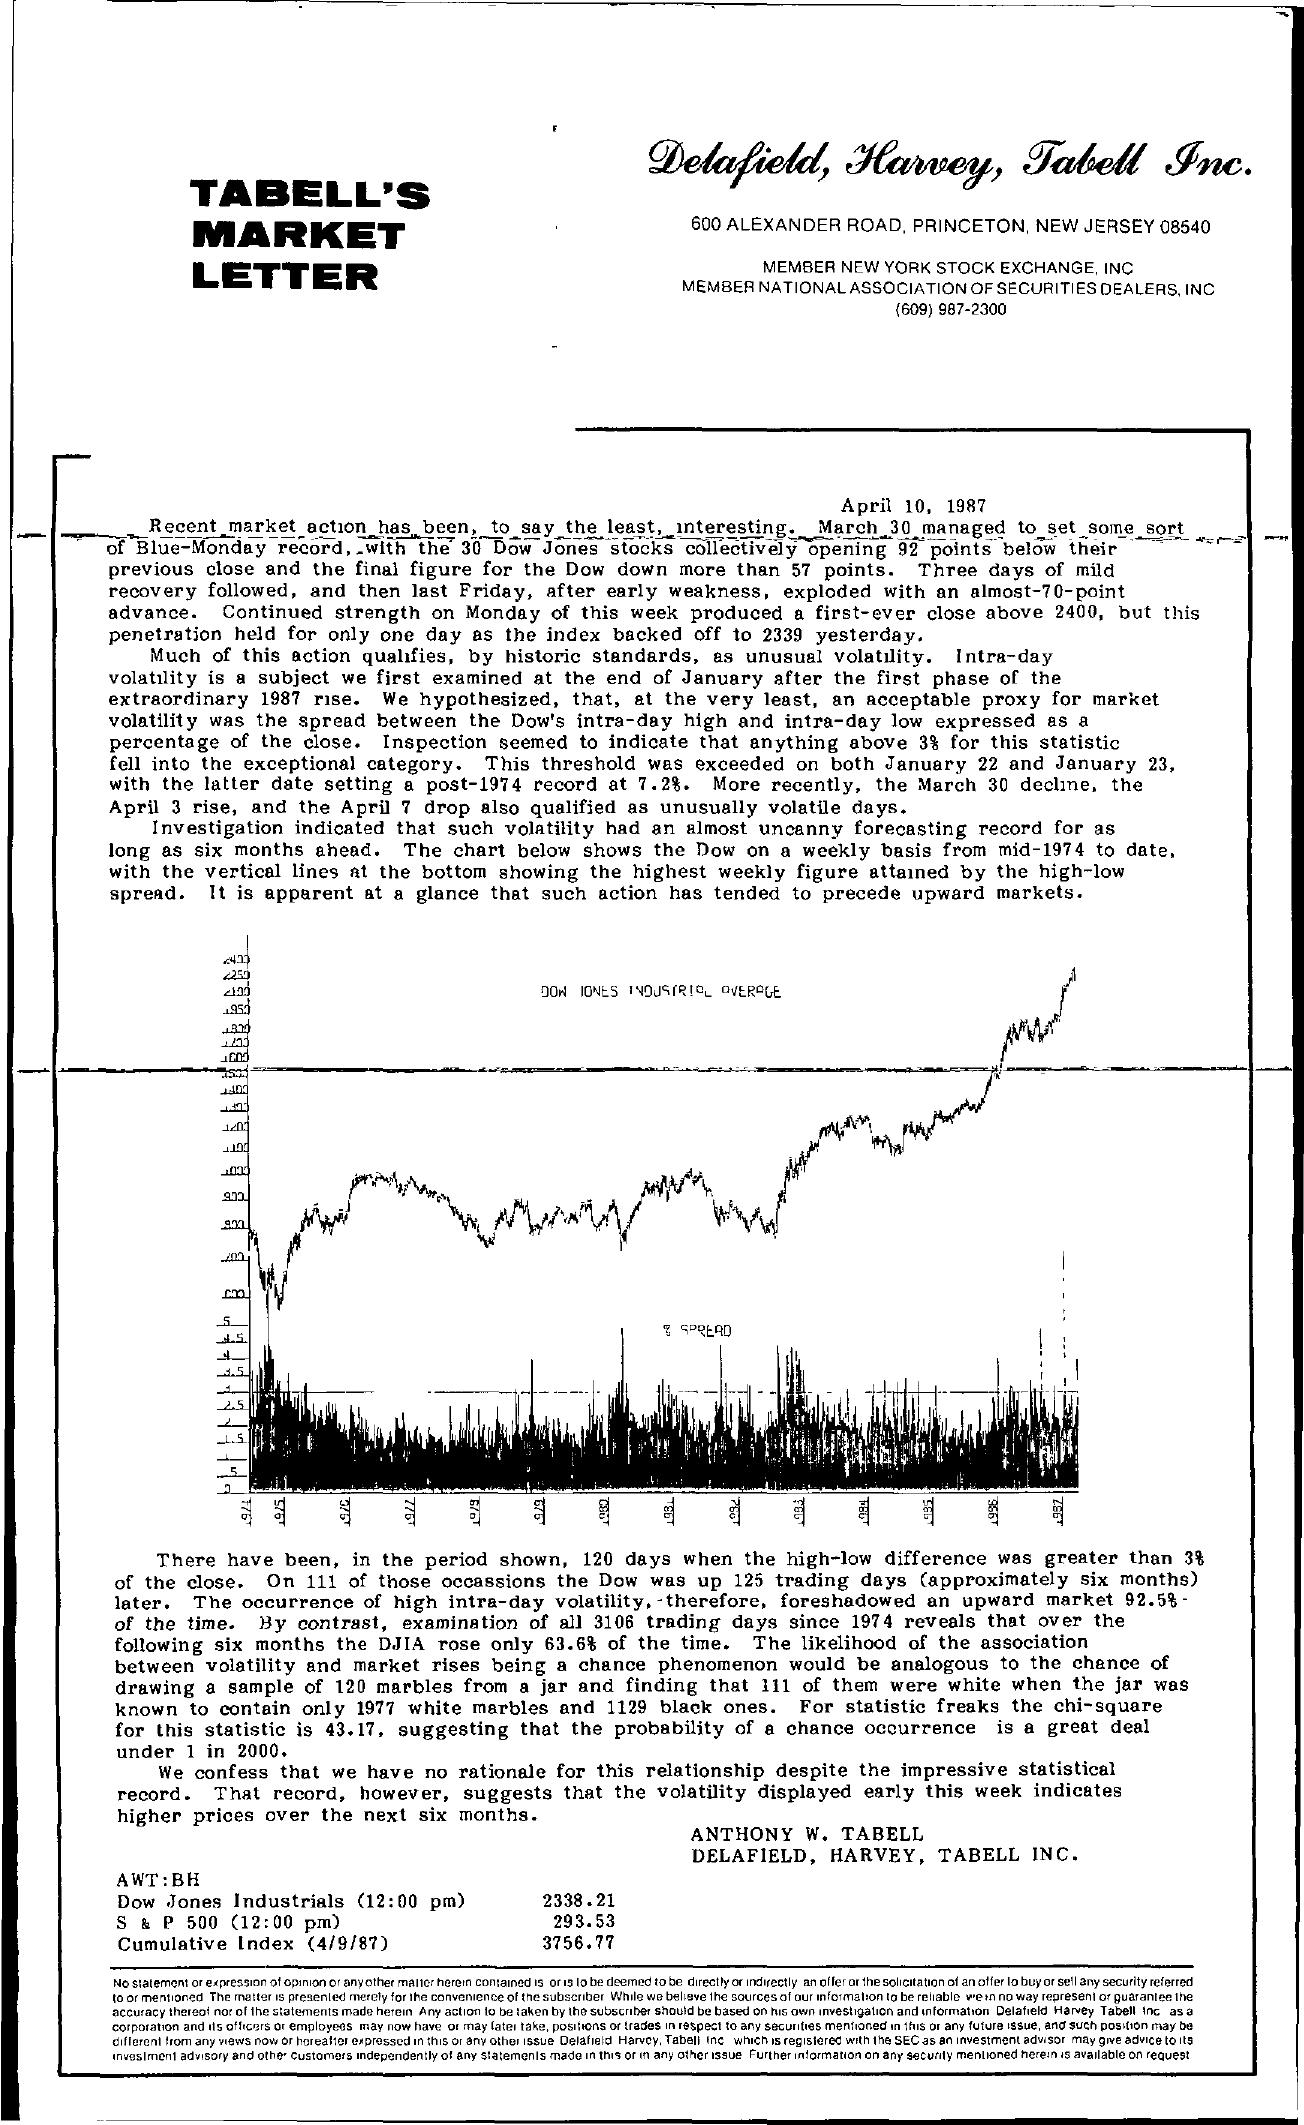 Tabell's Market Letter - April 10, 1987